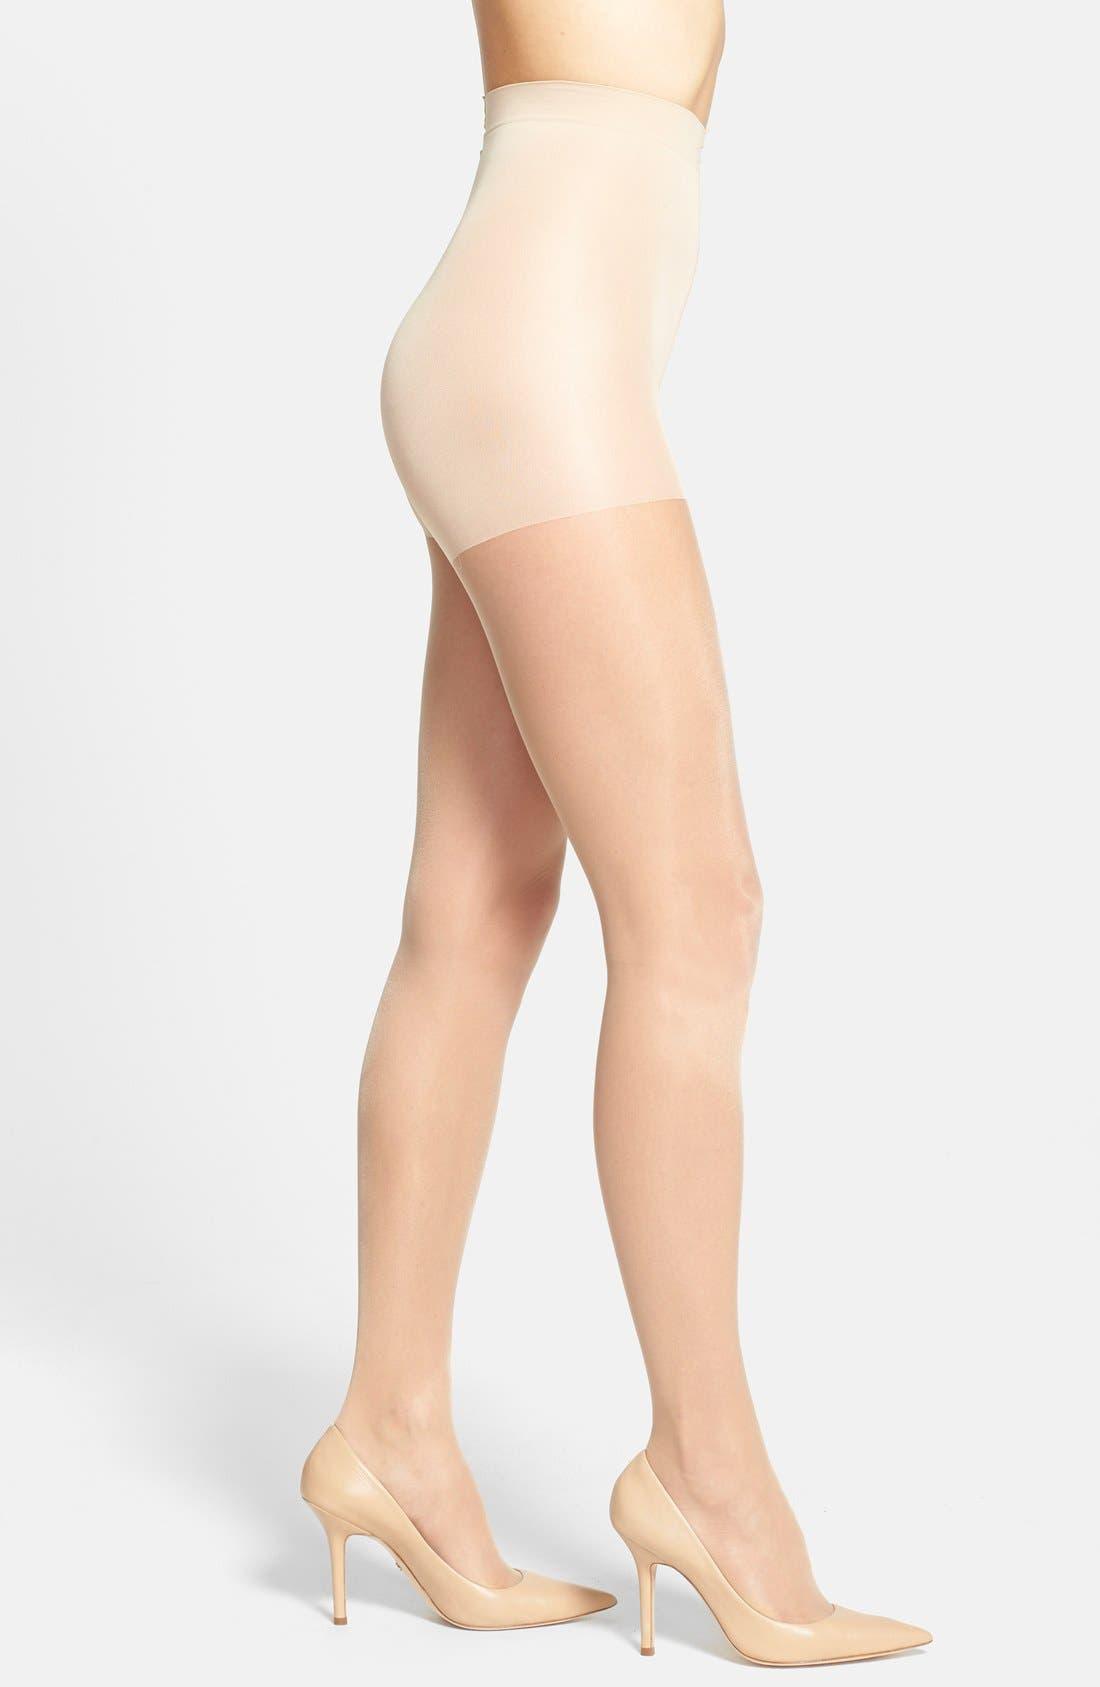 Alternate Image 1 Selected - Calvin Klein 'Sheer Essentials - Matte Ultra Sheer' Control Top Pantyhose